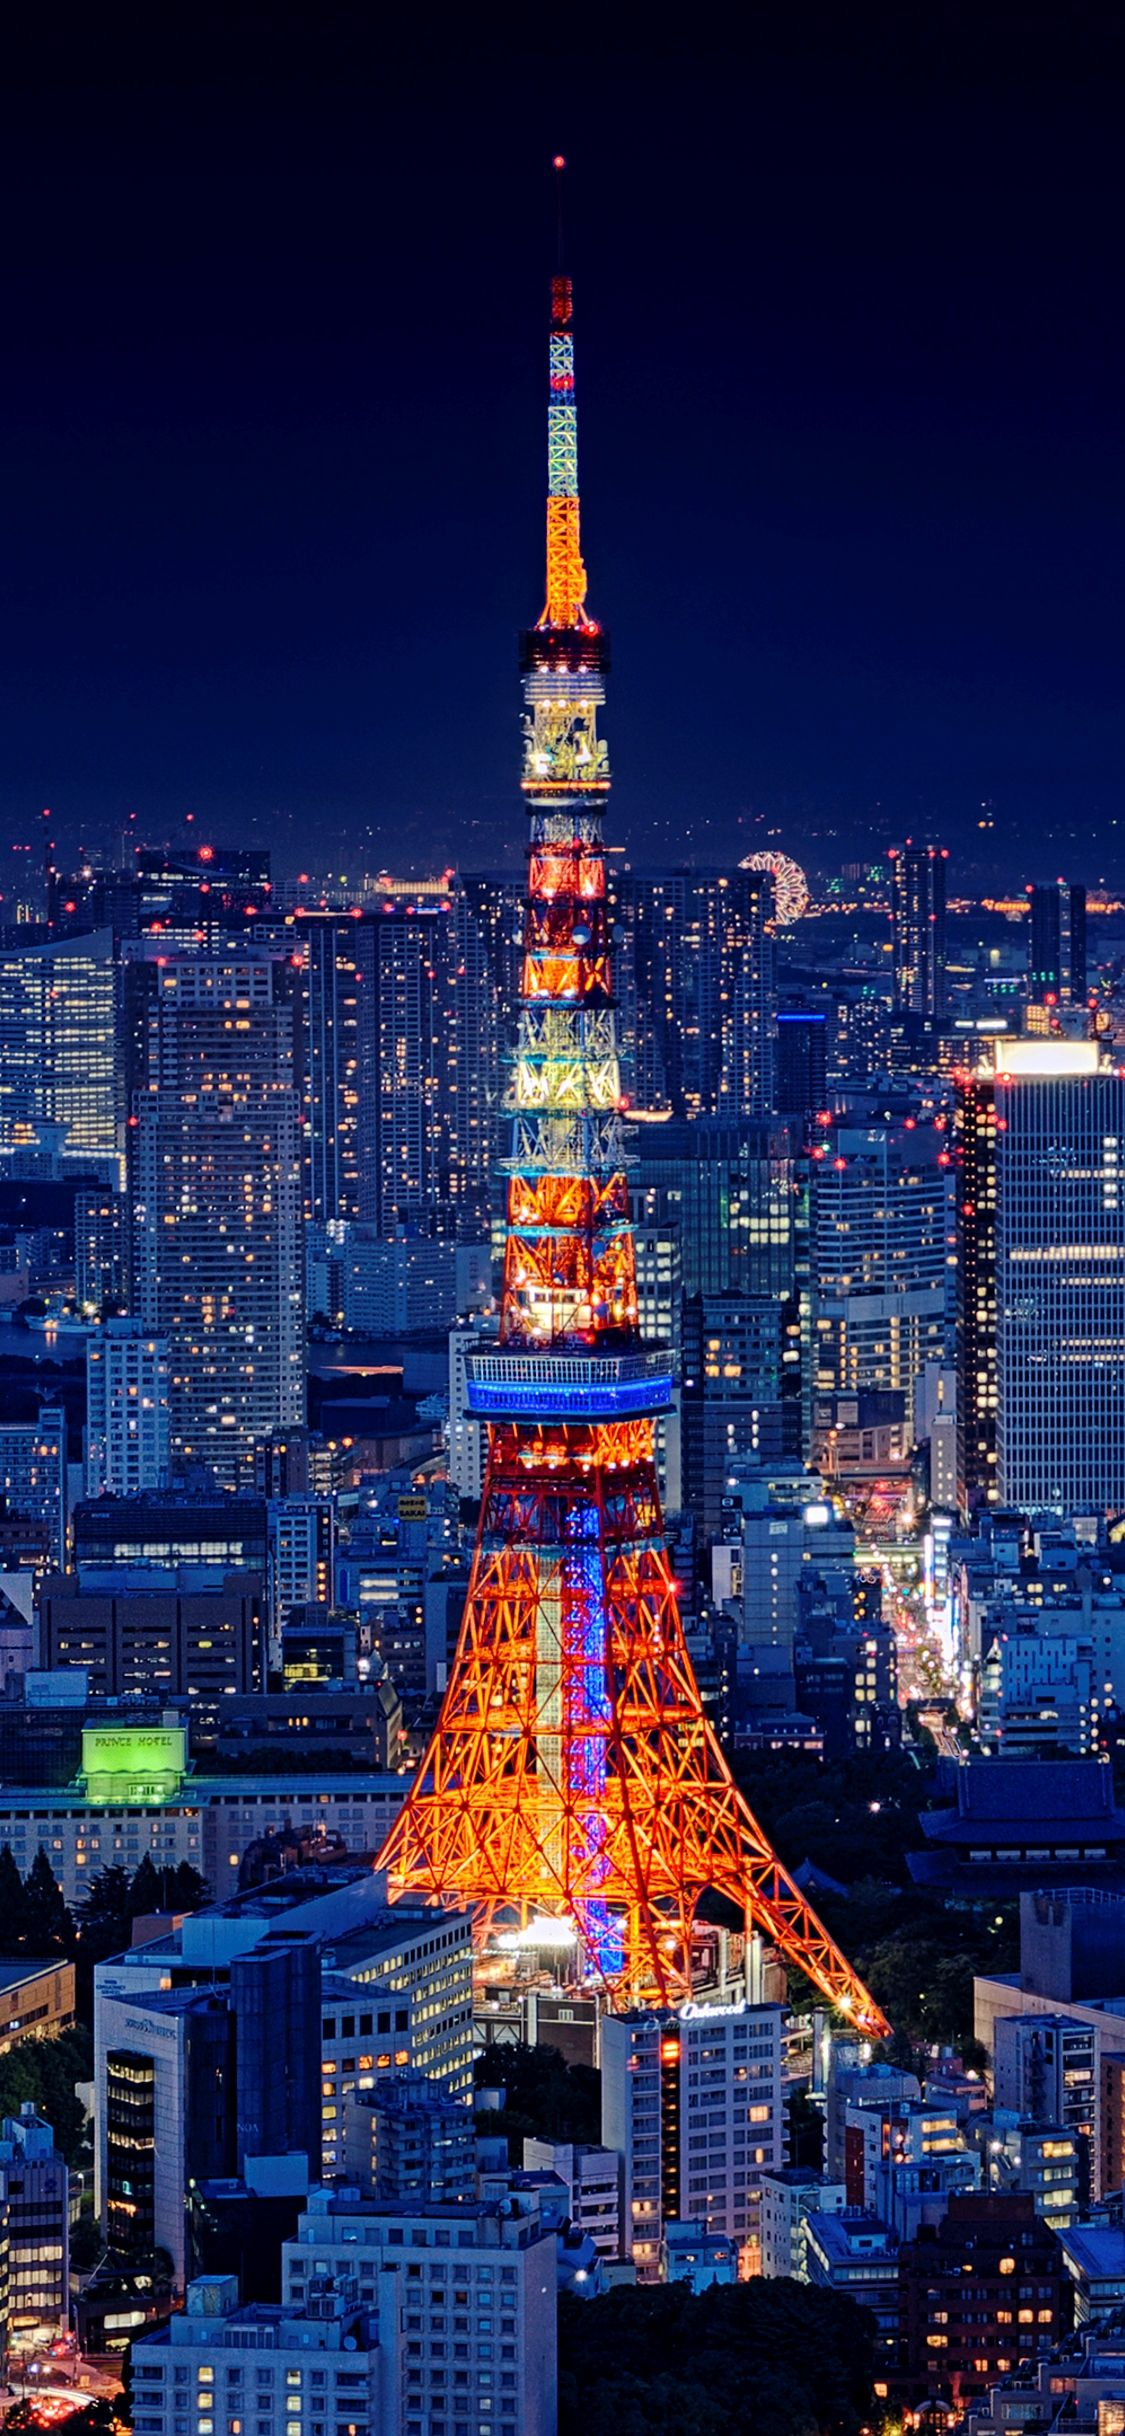 Tokyo Wallpaper 4k Iphone Gallery 東京タワー 日本 夜景 東京 風景